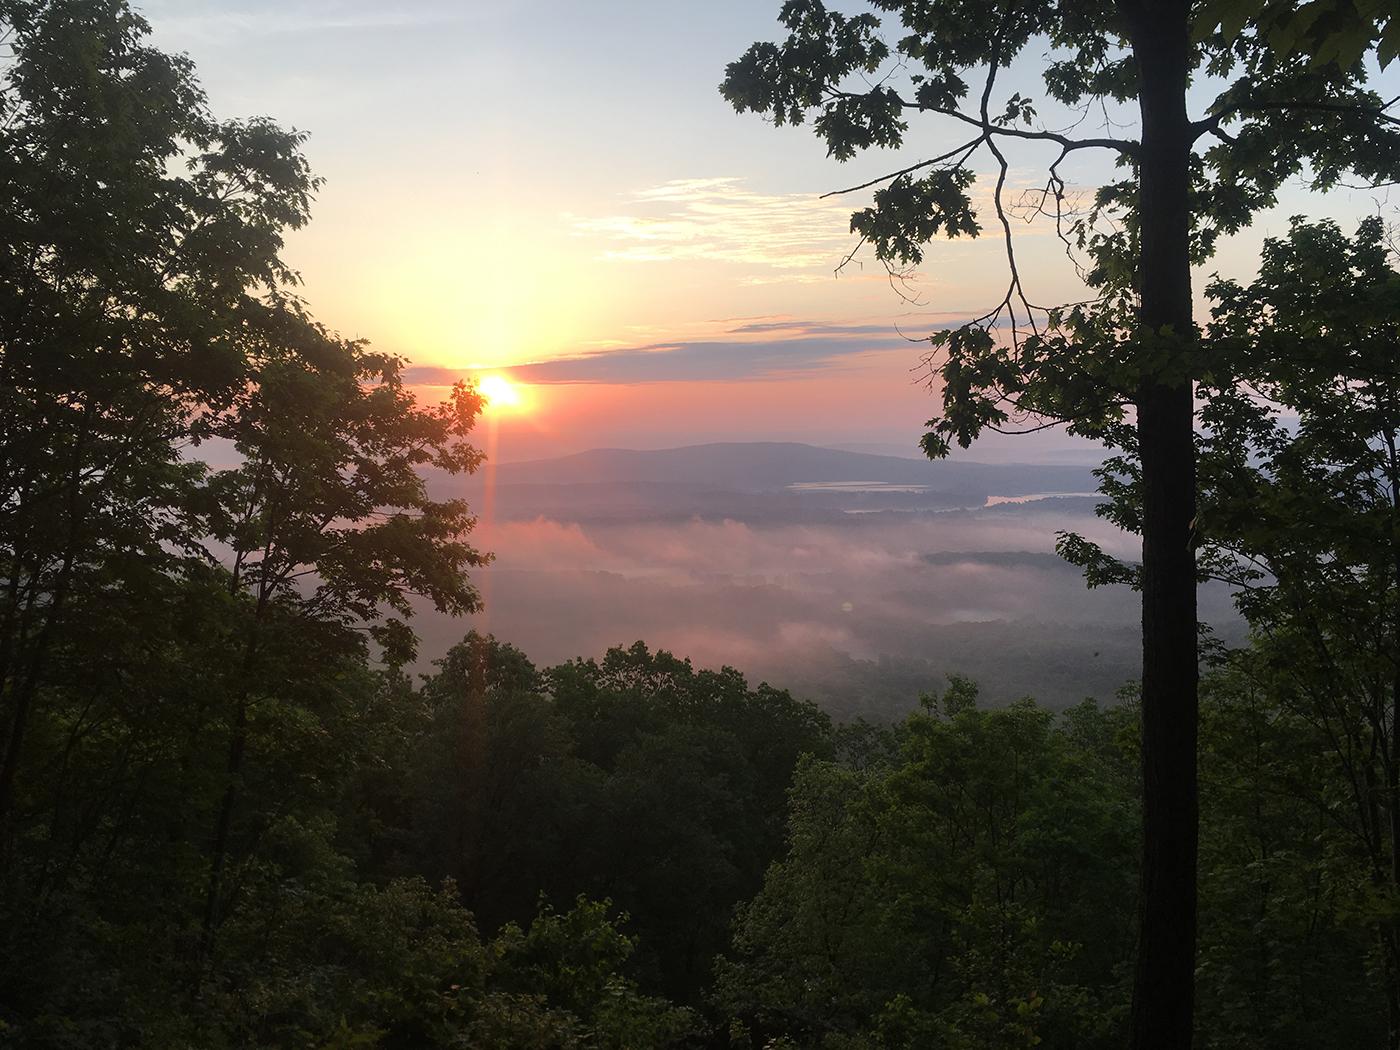 appalachian trail in connecticut